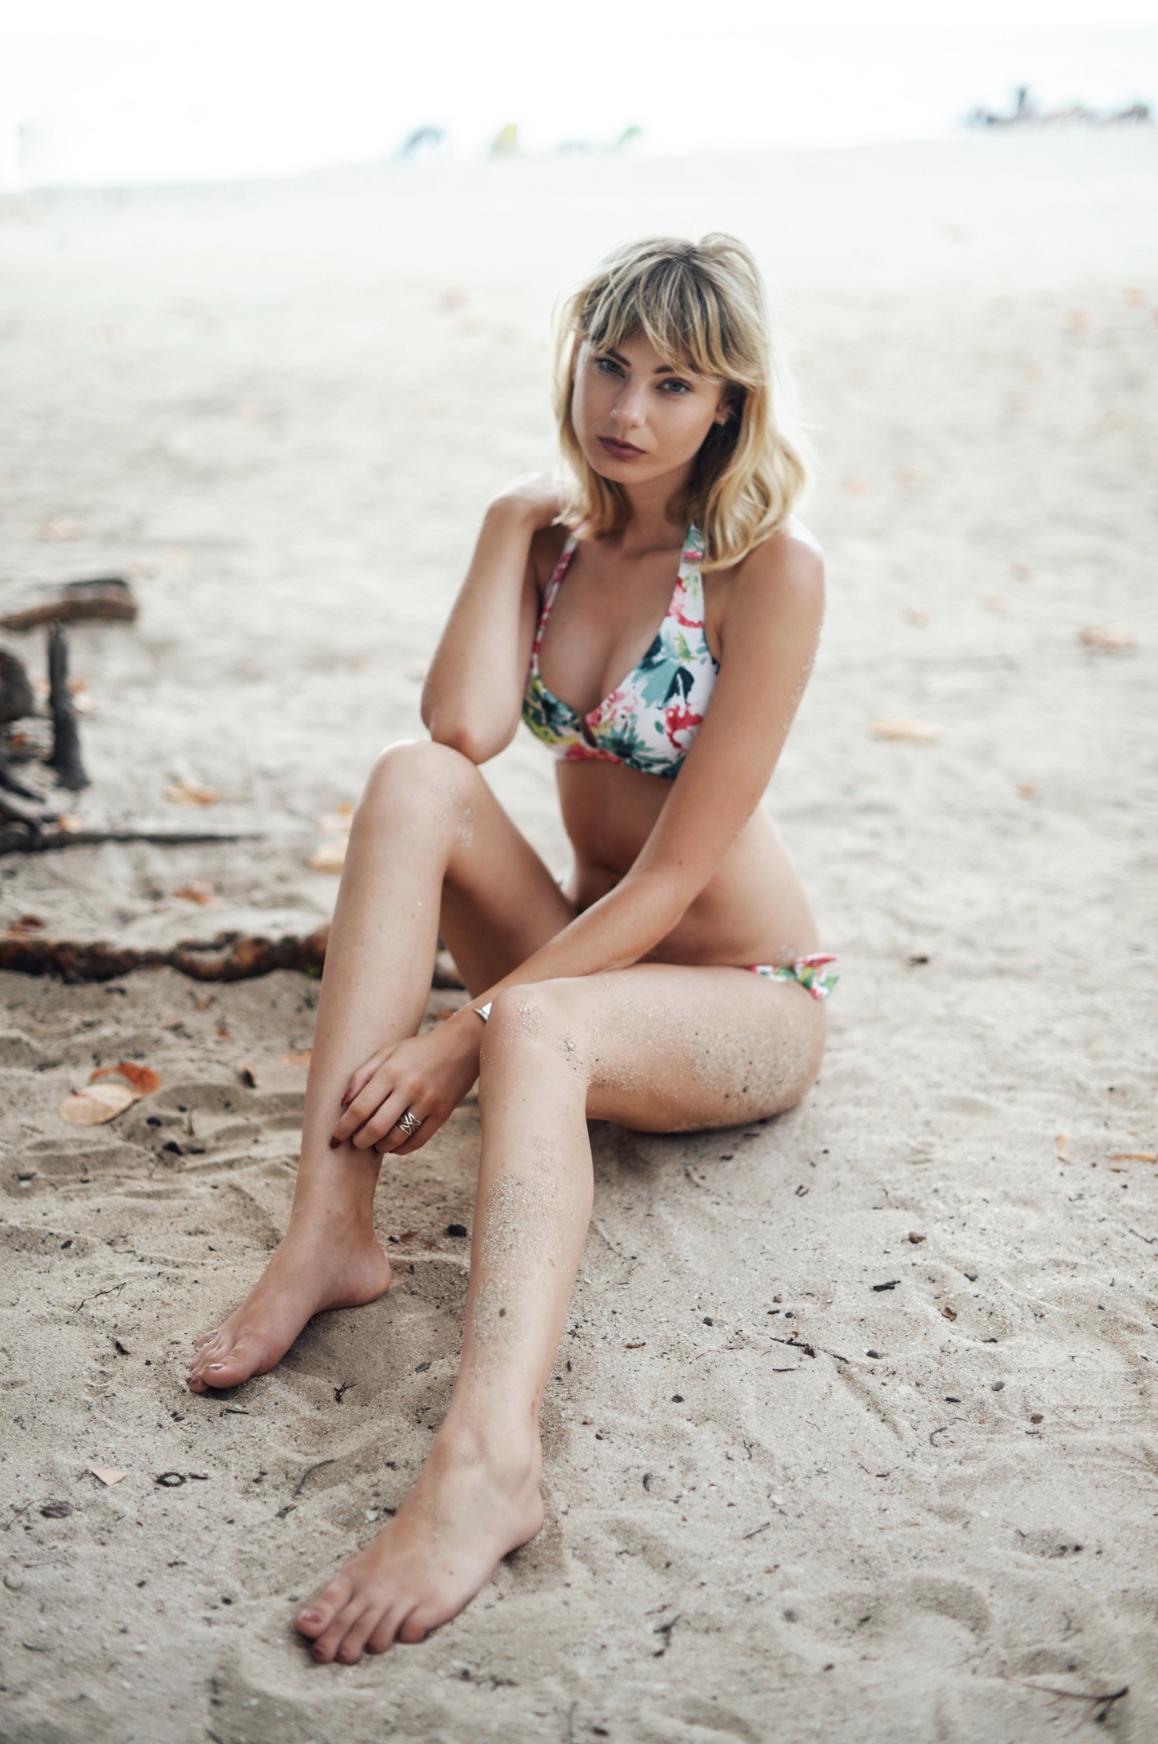 Bikini Trends 2017-Kiamisu_Modeblog_Fashionblog_Andres Sarda Bikini_Sommer Bikini_Bikini finden_Bikini Tipps-final7